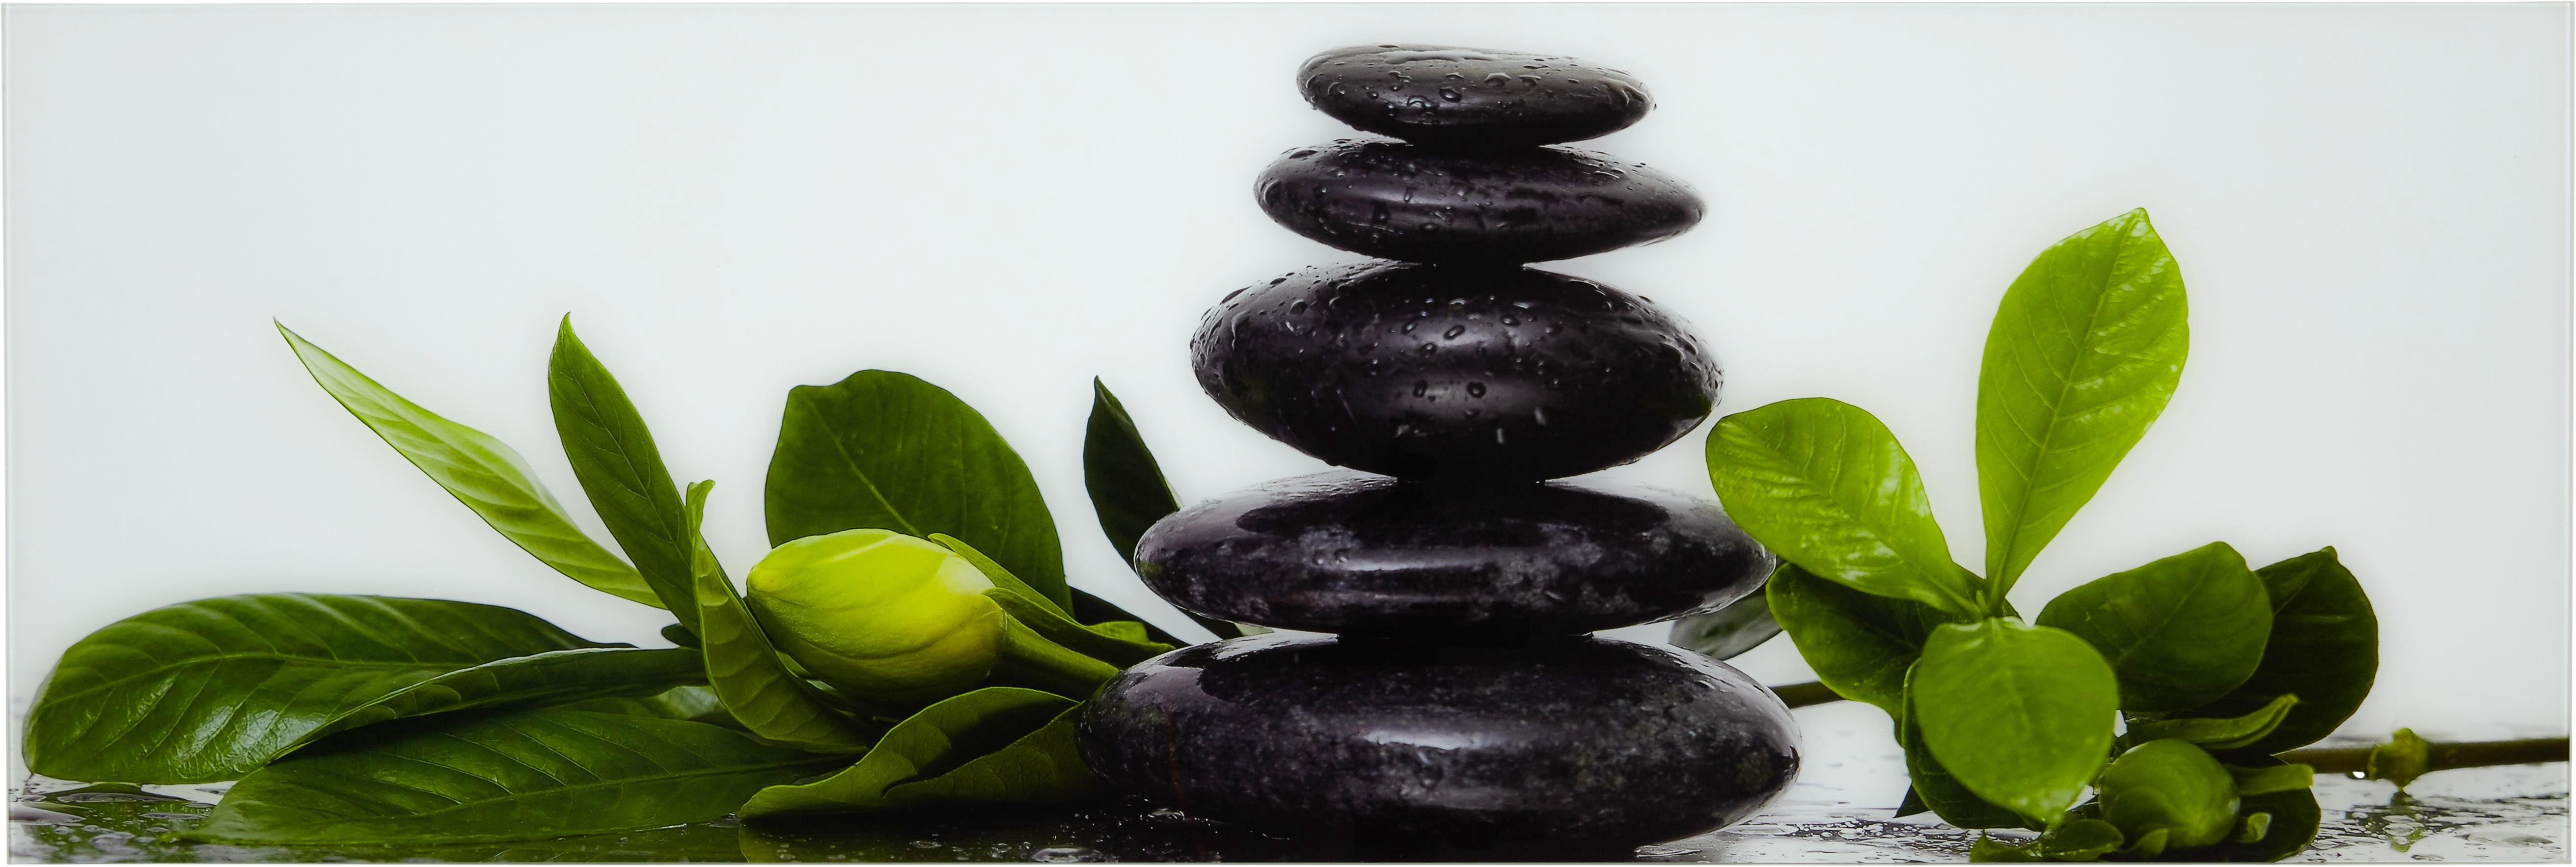 Glasbild Fresh Gardenia, ca. 33x98x2cm - Multicolor, MODERN, Glas (33/98/2cm) - MÖMAX modern living